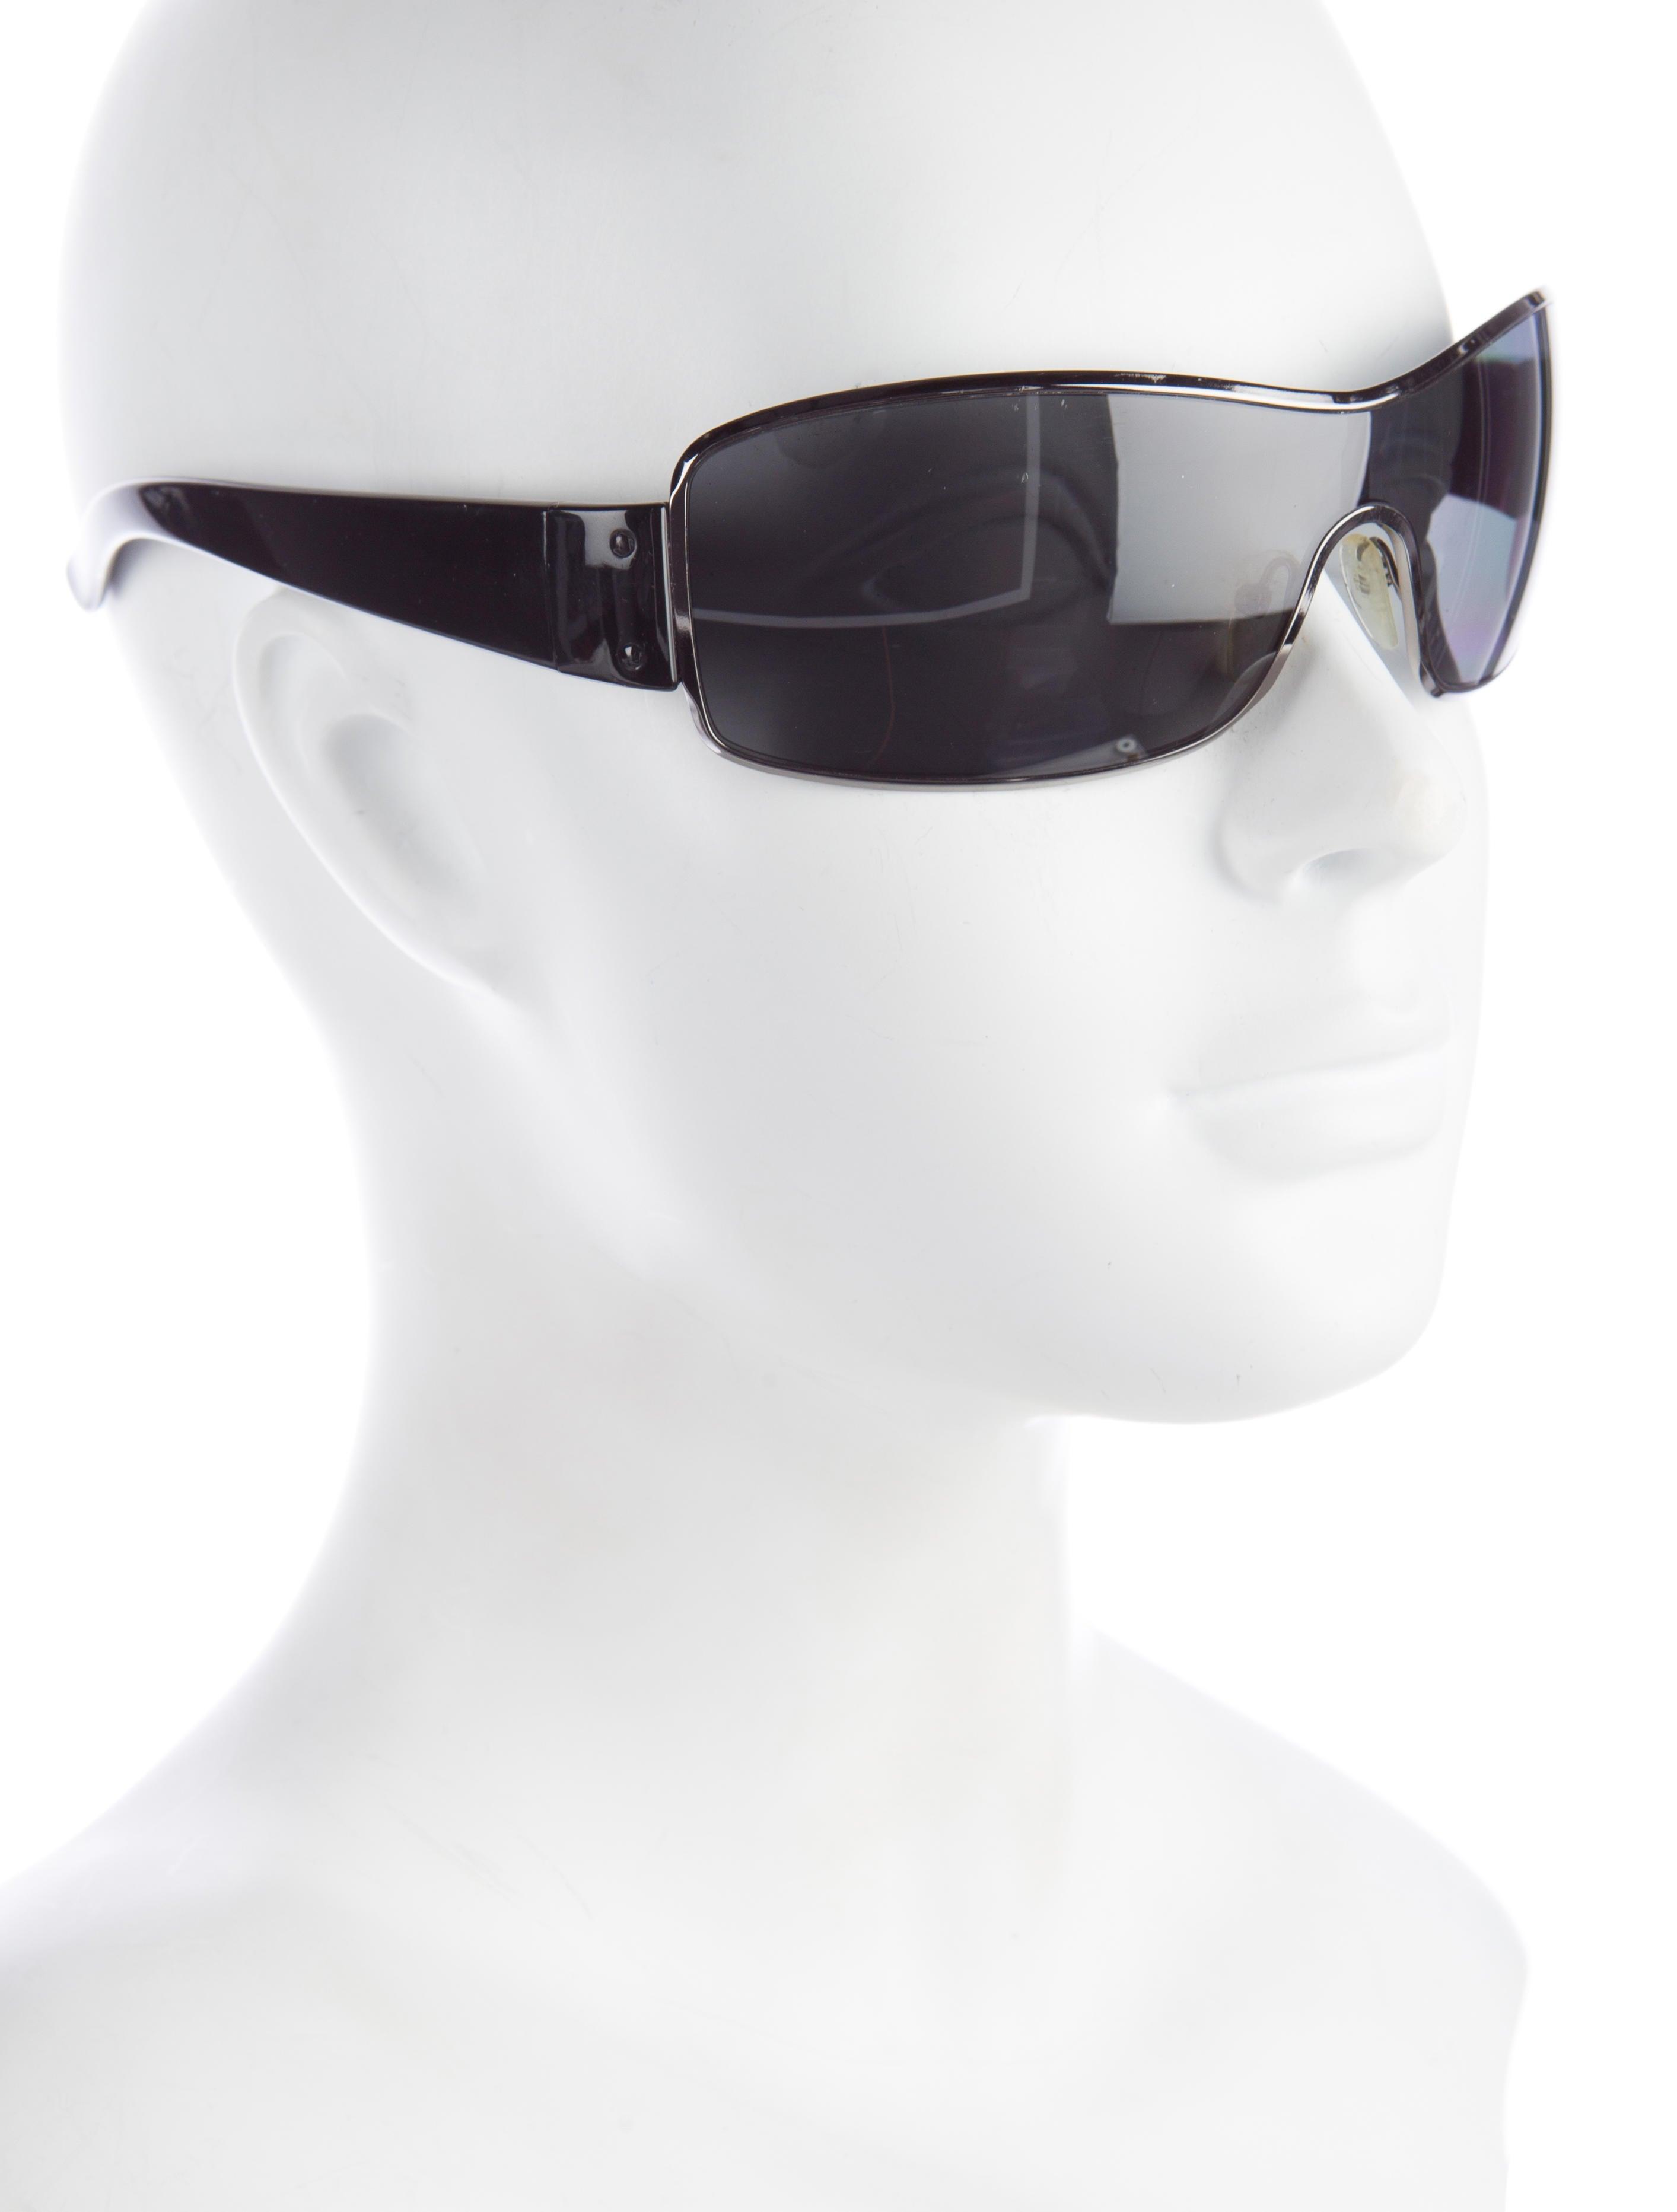 b5b1dfb359 Polarized Prada Sunglasses « Heritage Malta